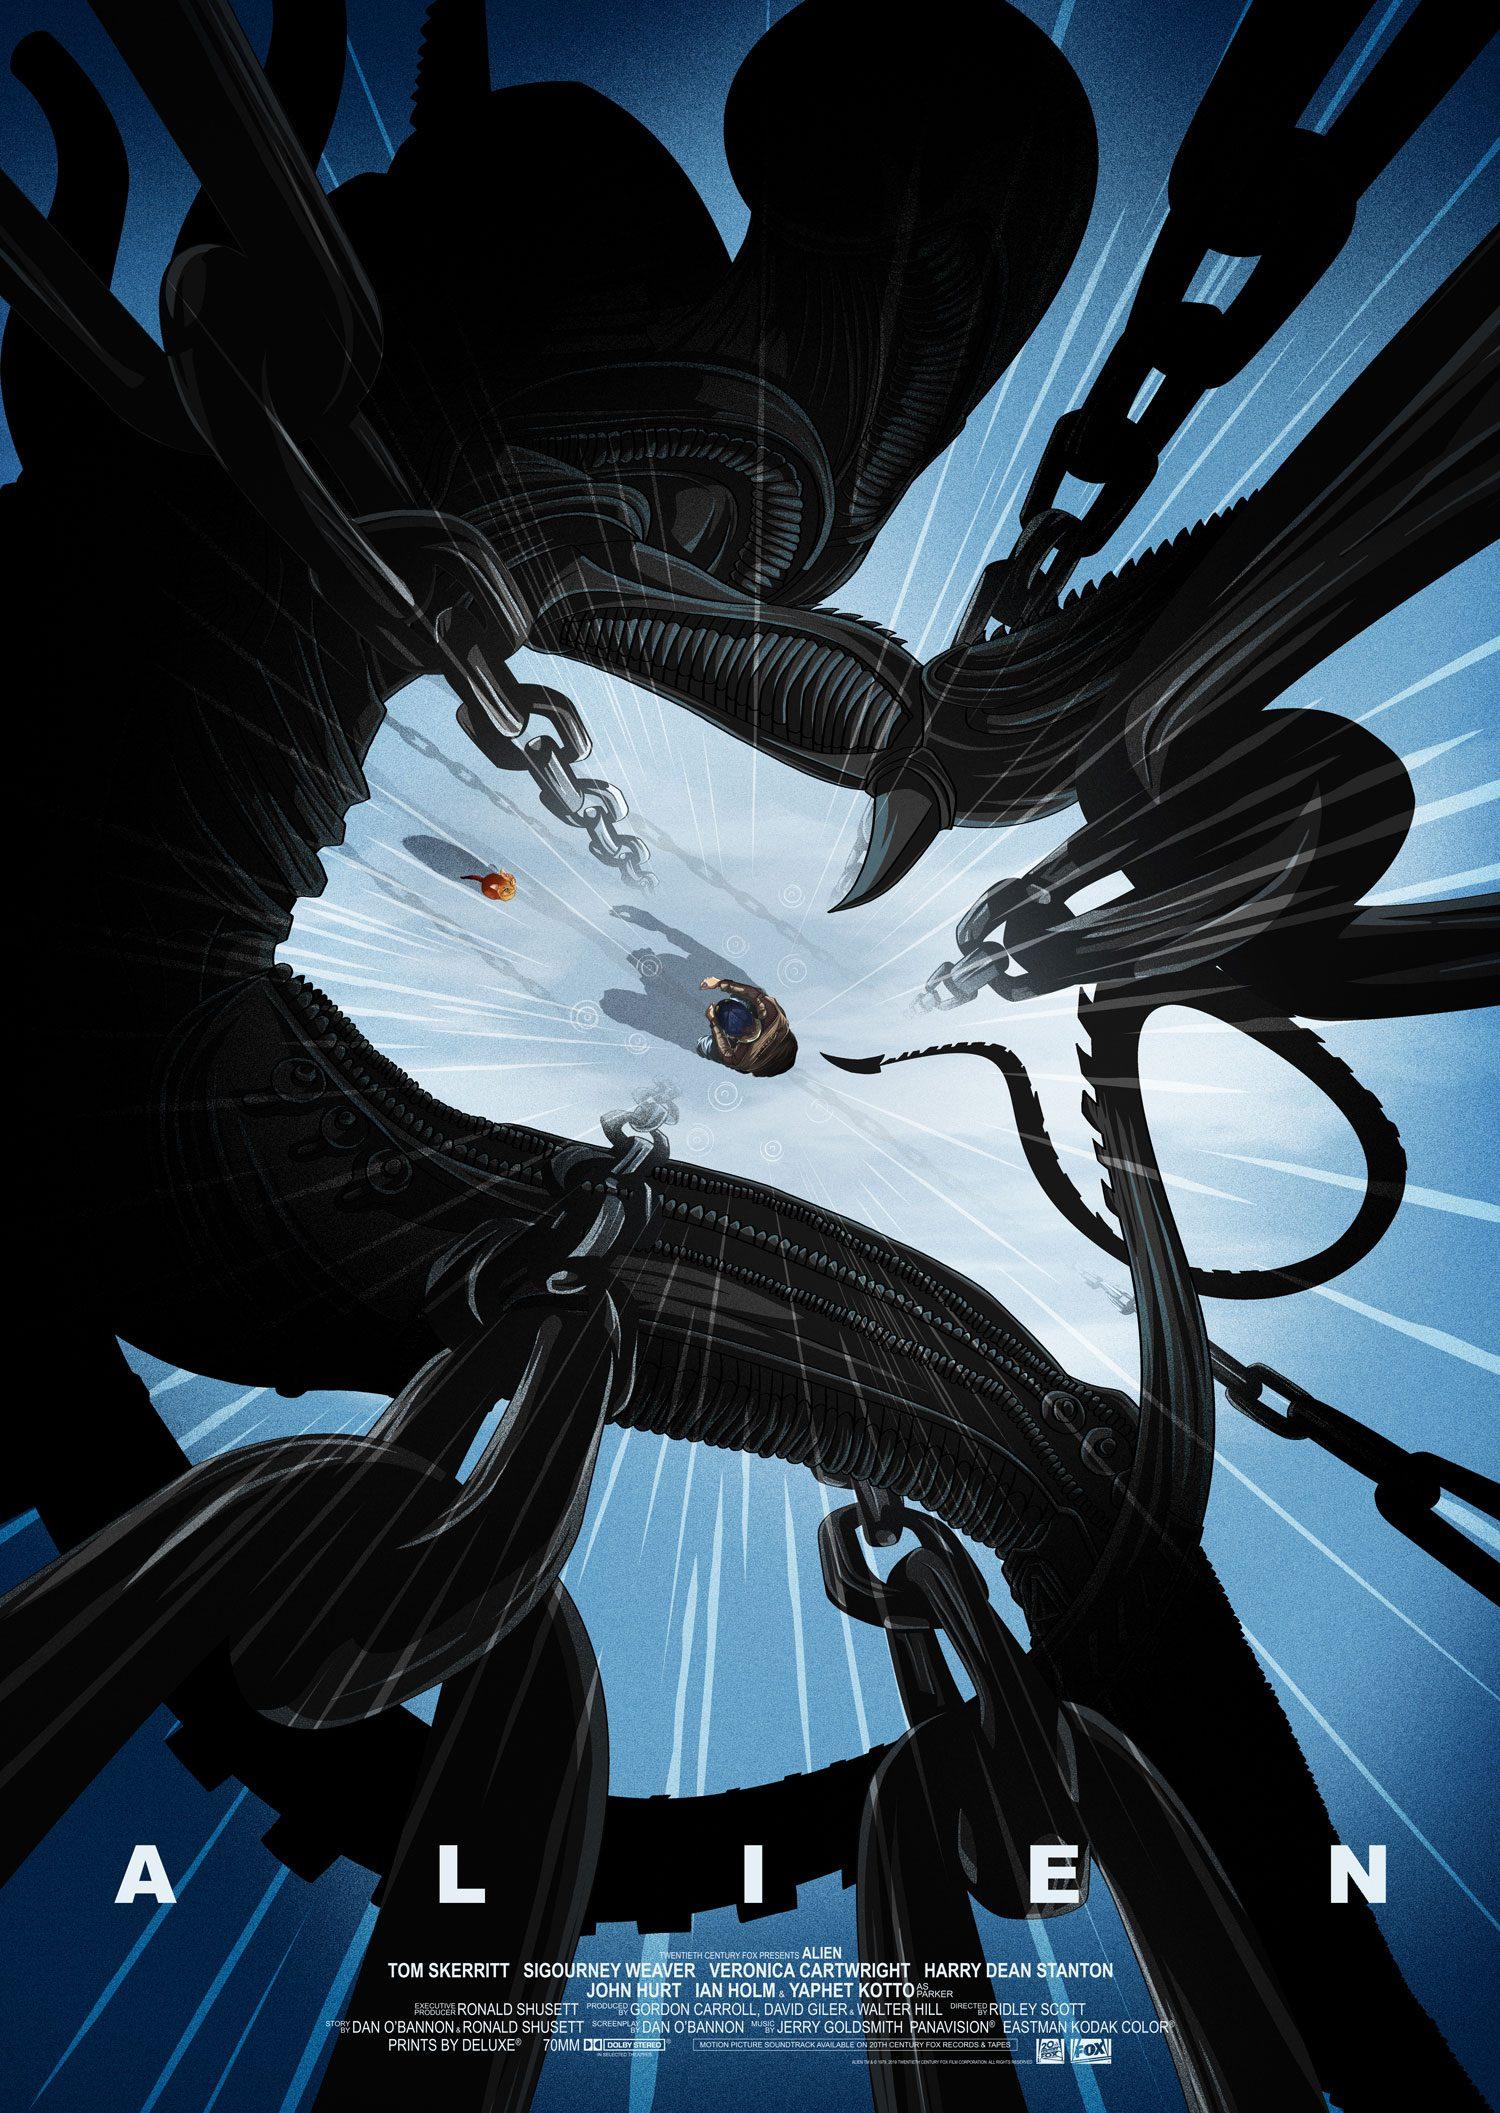 Alien Art Print Attack 42 x 30 cm